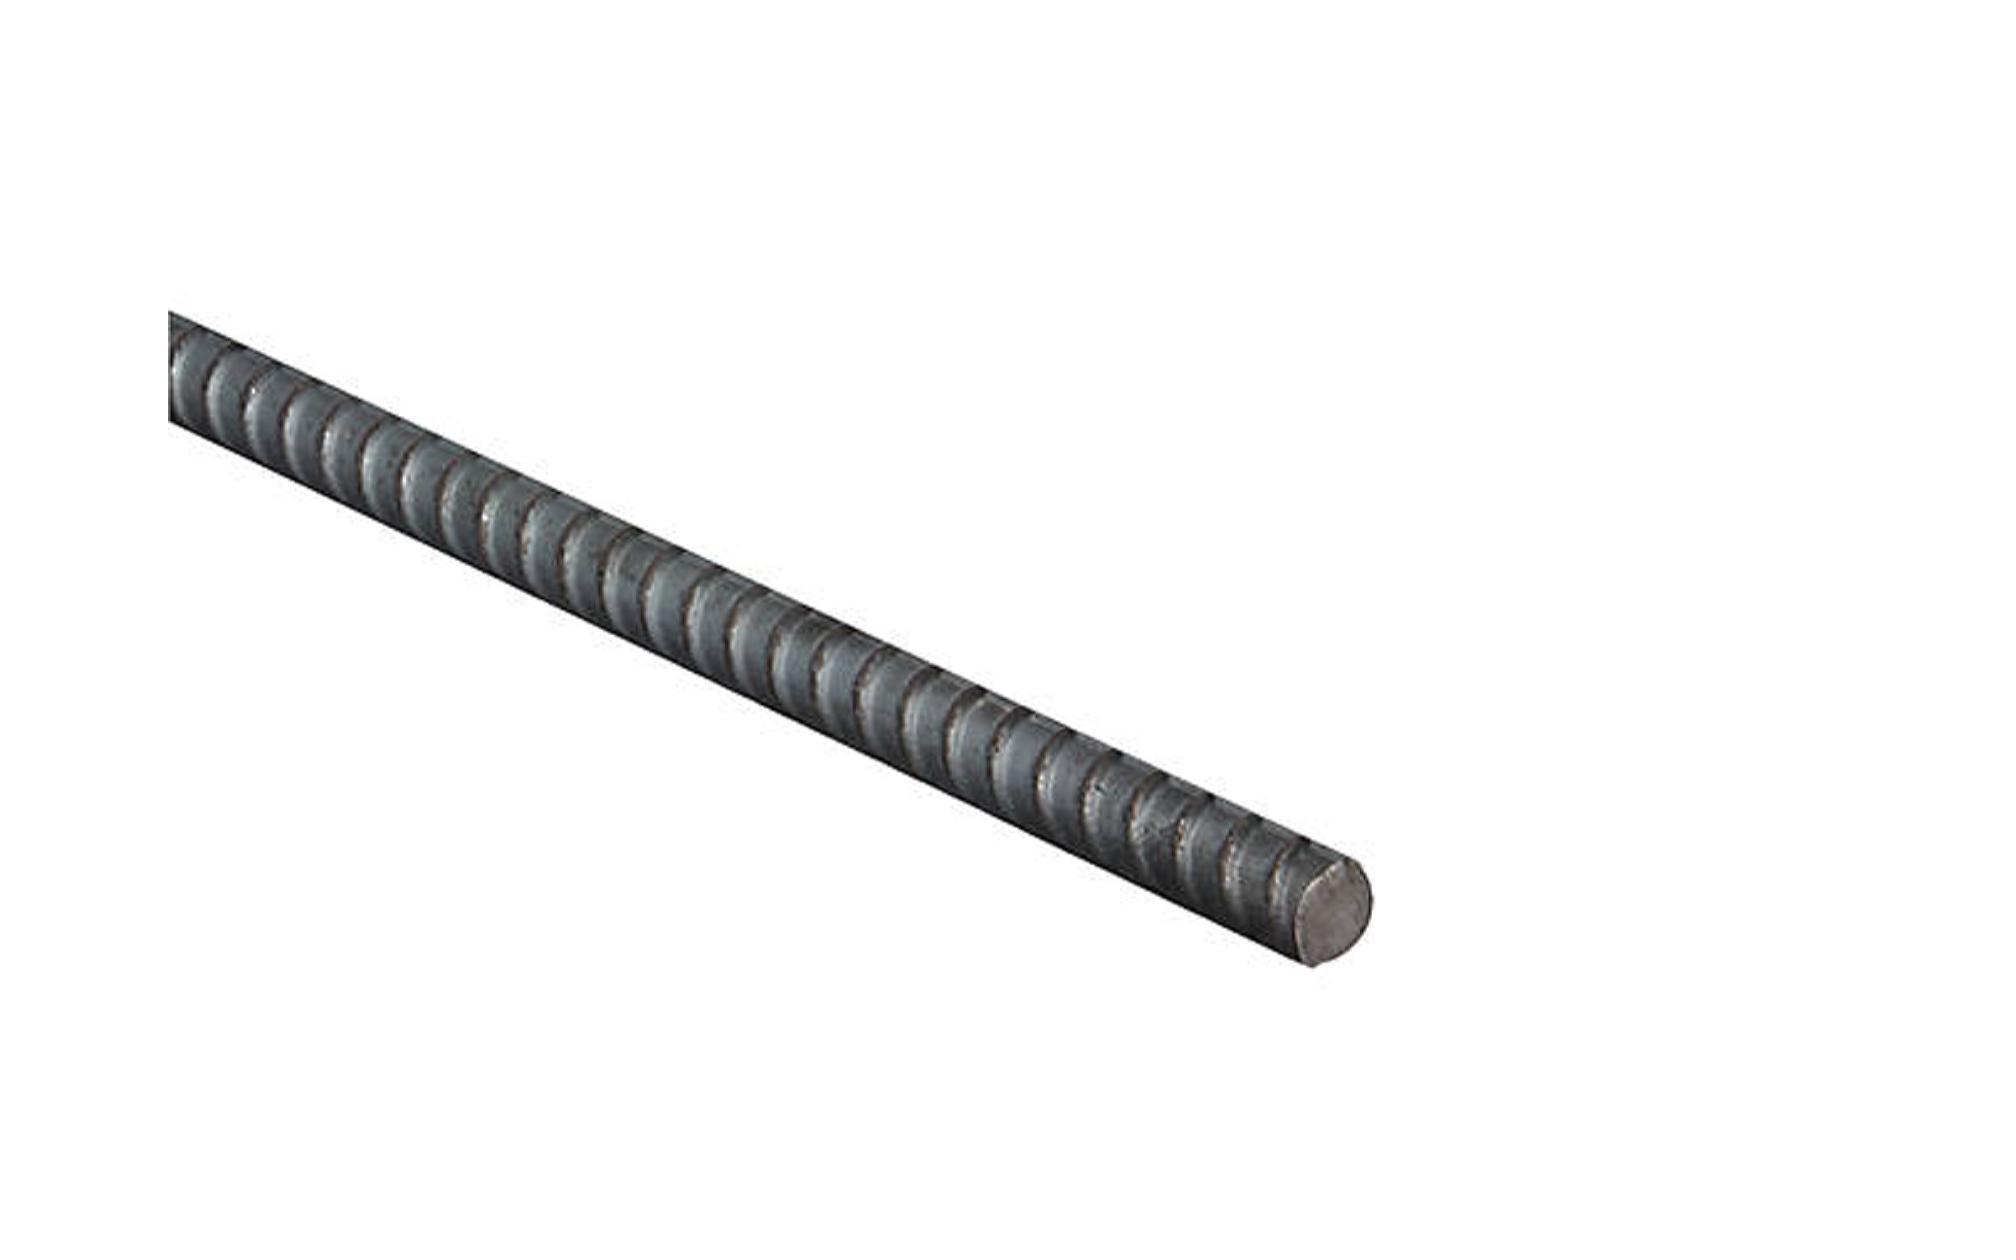 Steel Rod (Civils)